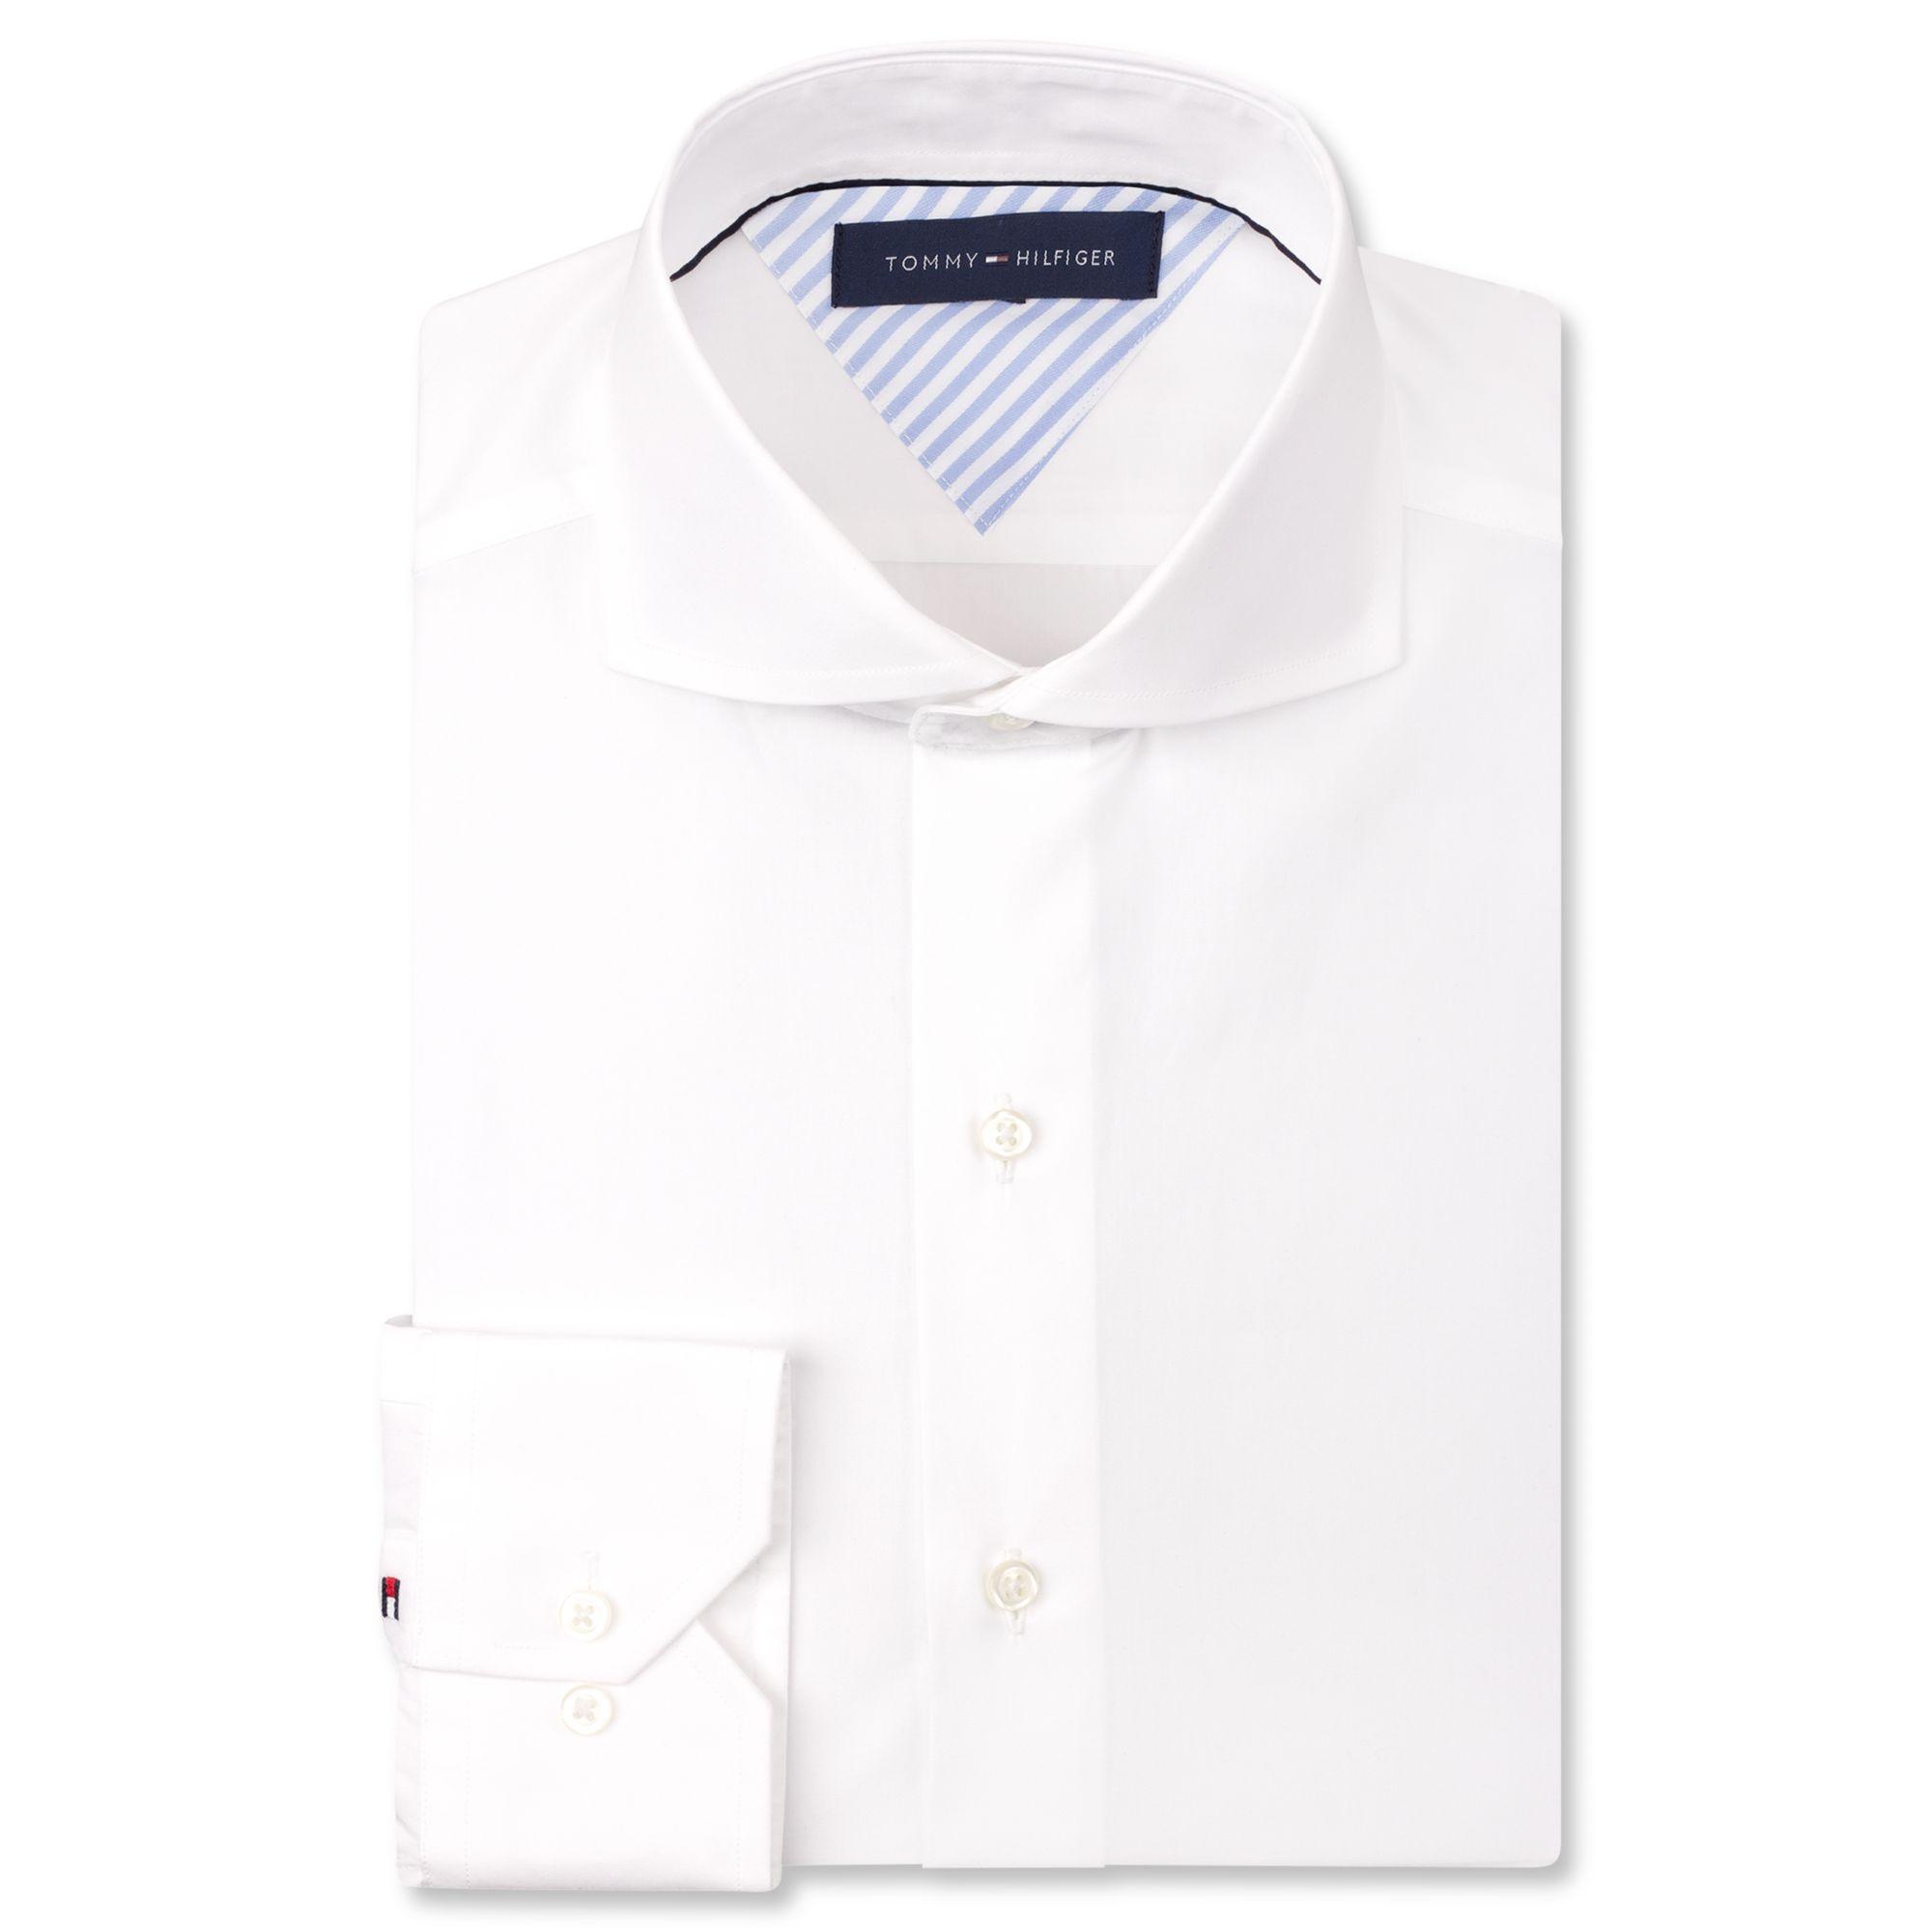 Tommy hilfiger white cutaway collar dress shirt in white for White cutaway collar shirt